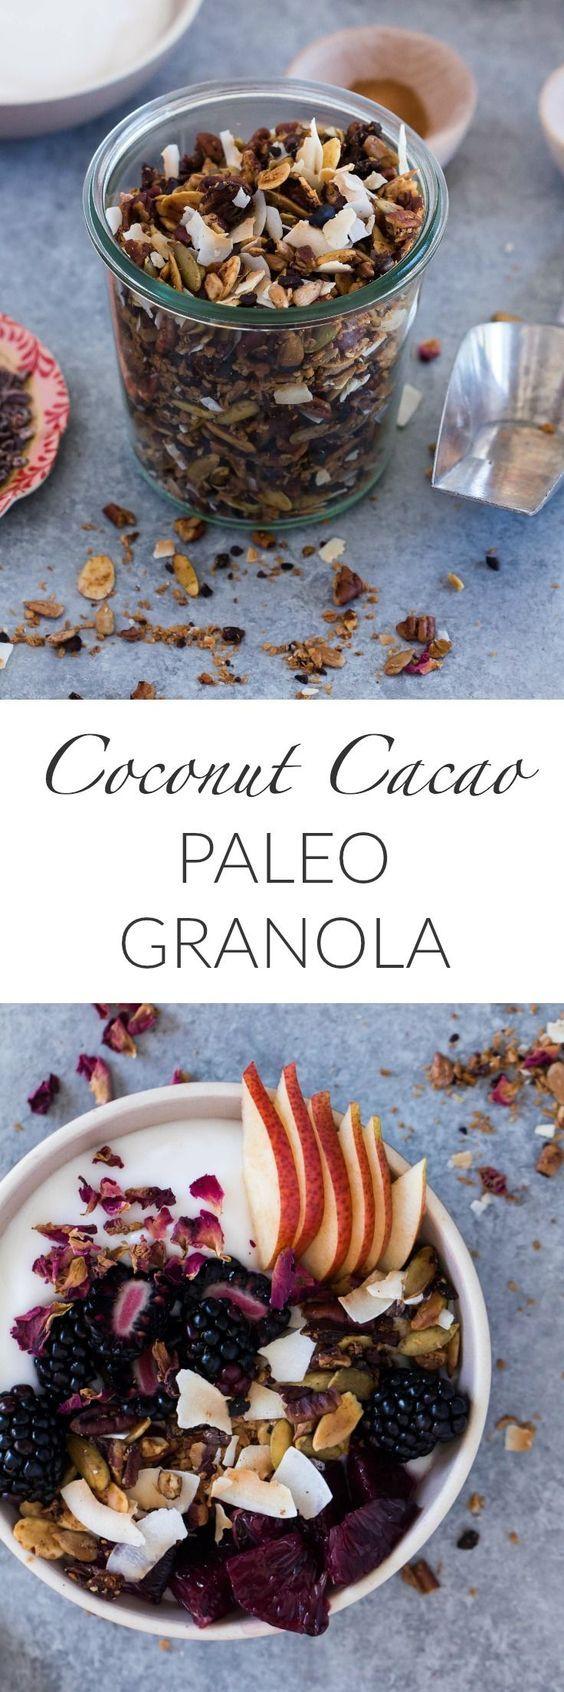 Coconut Cacao Paleo Granola   Recipe   Granola, Eat, Paleo ...